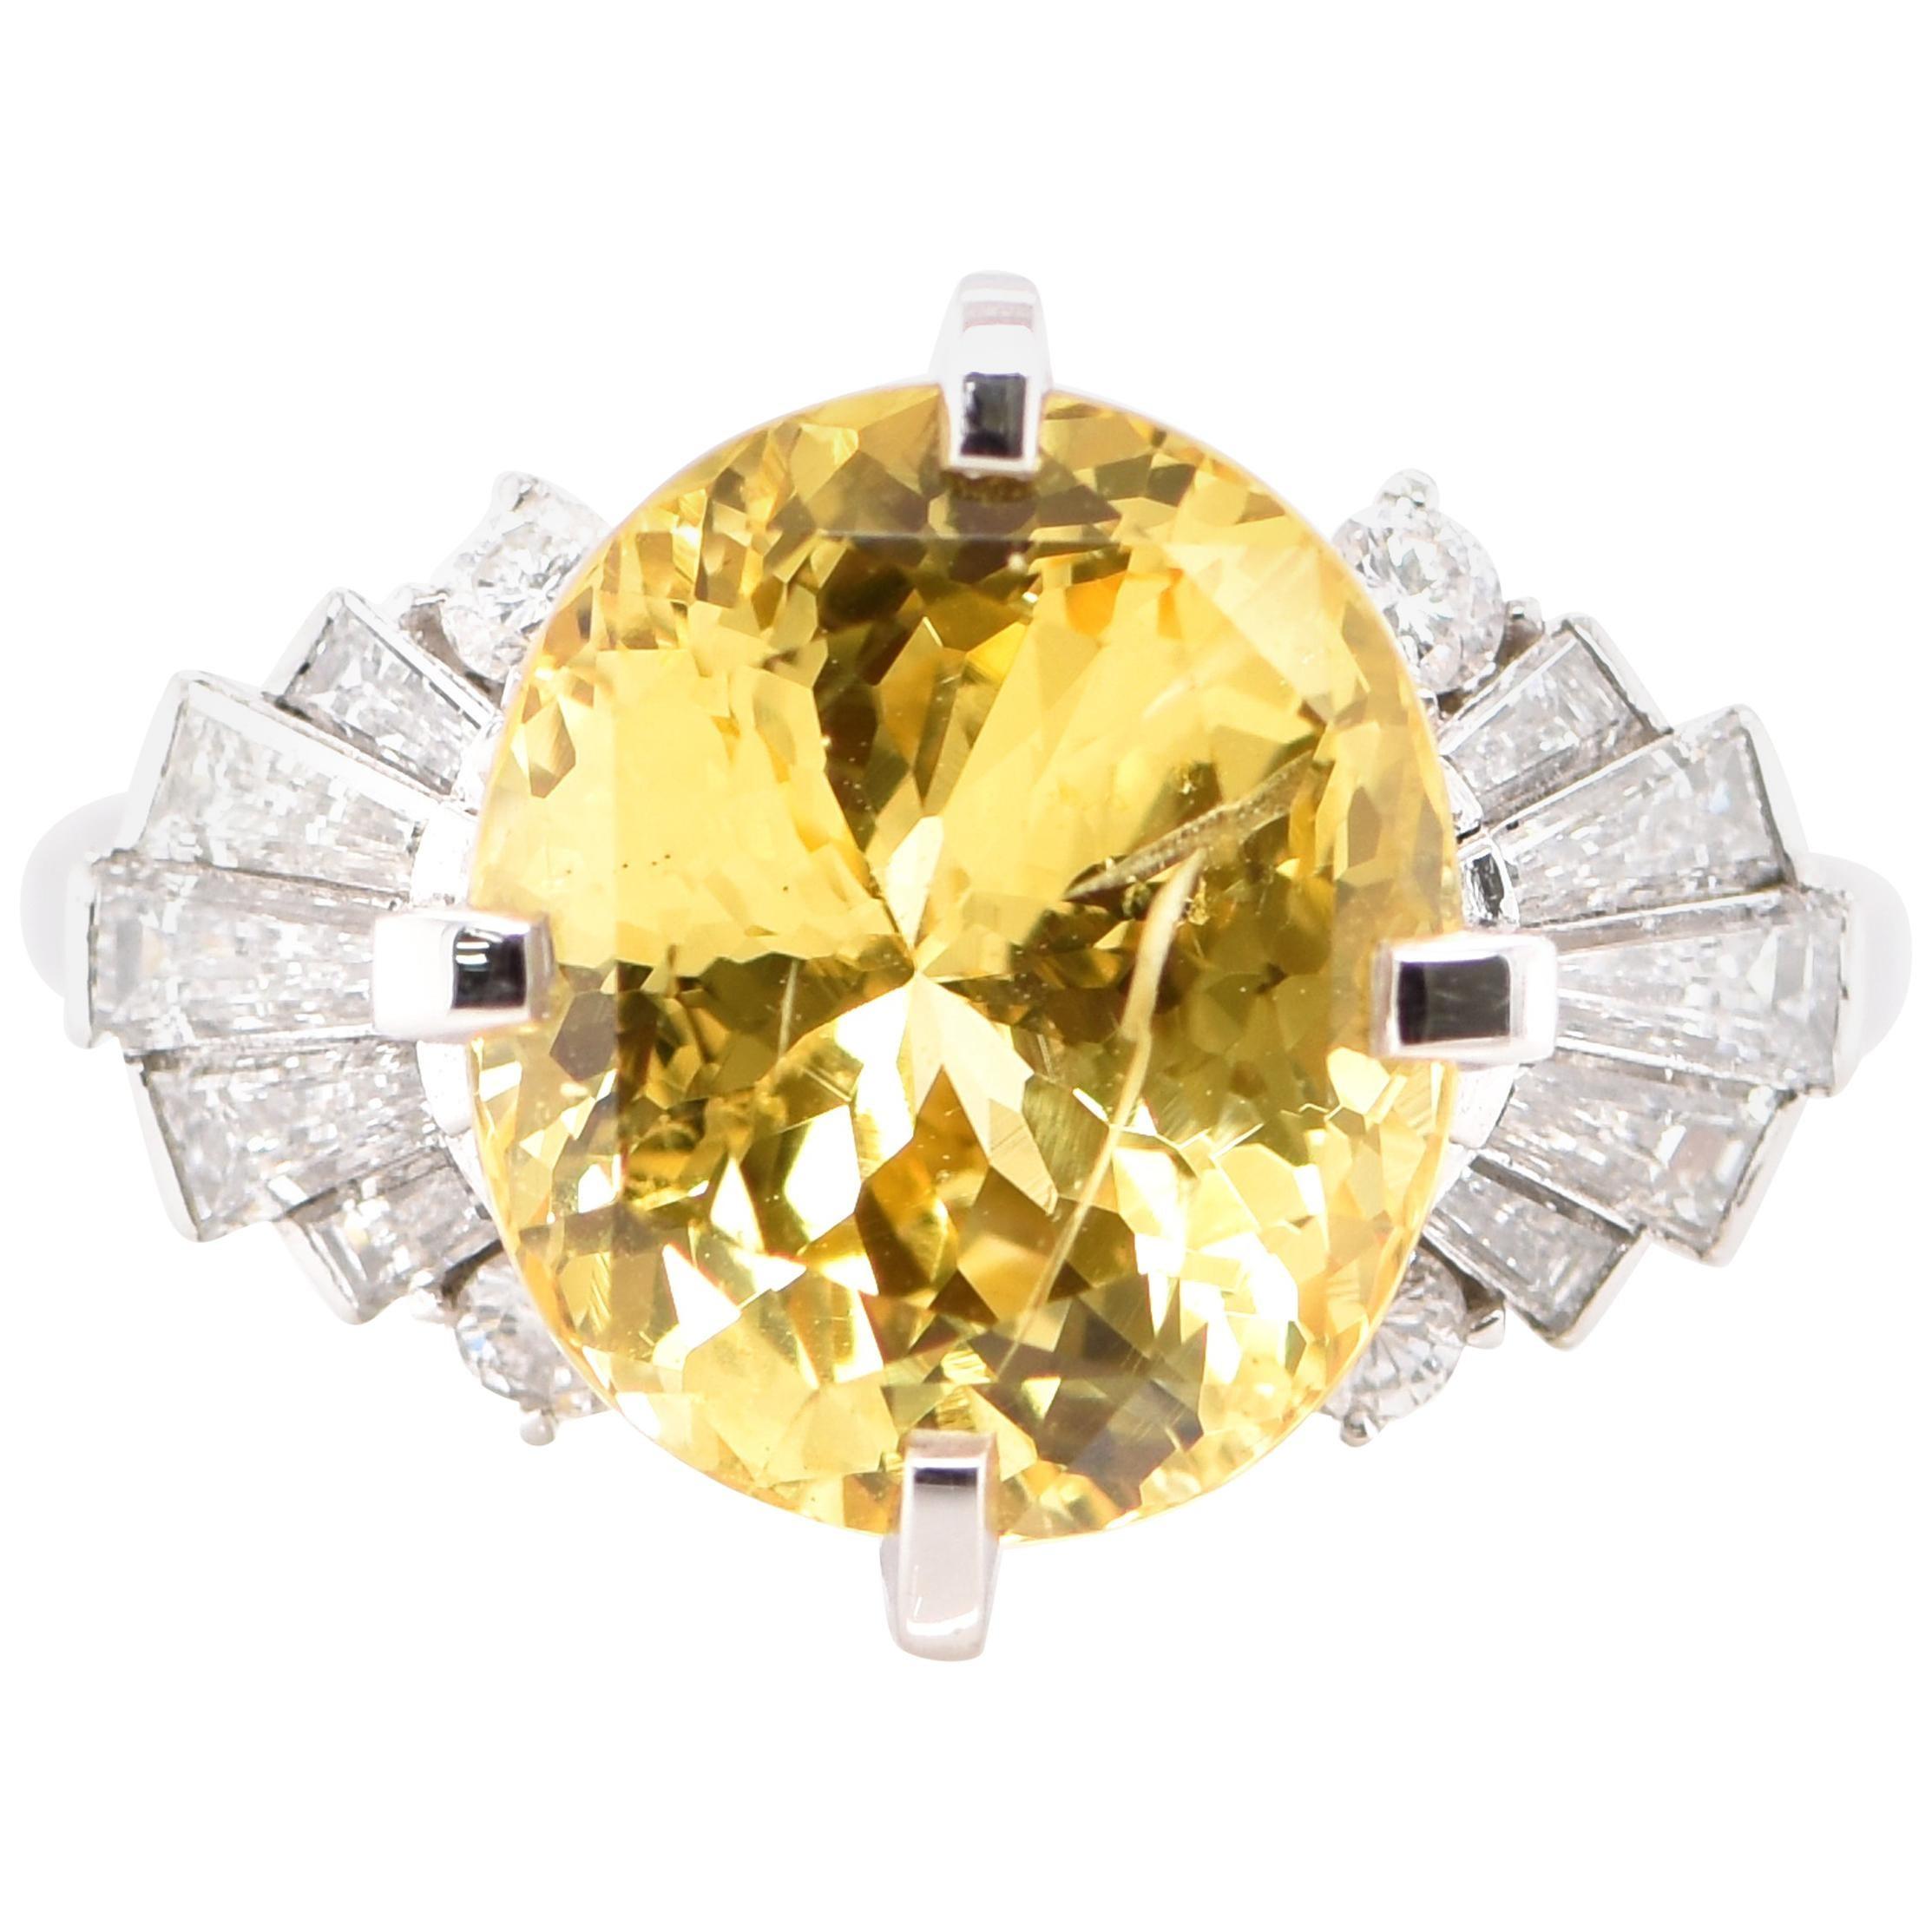 6.93 Carat Untreated Yellow Sapphire and Diamond Ring Set in Platinum